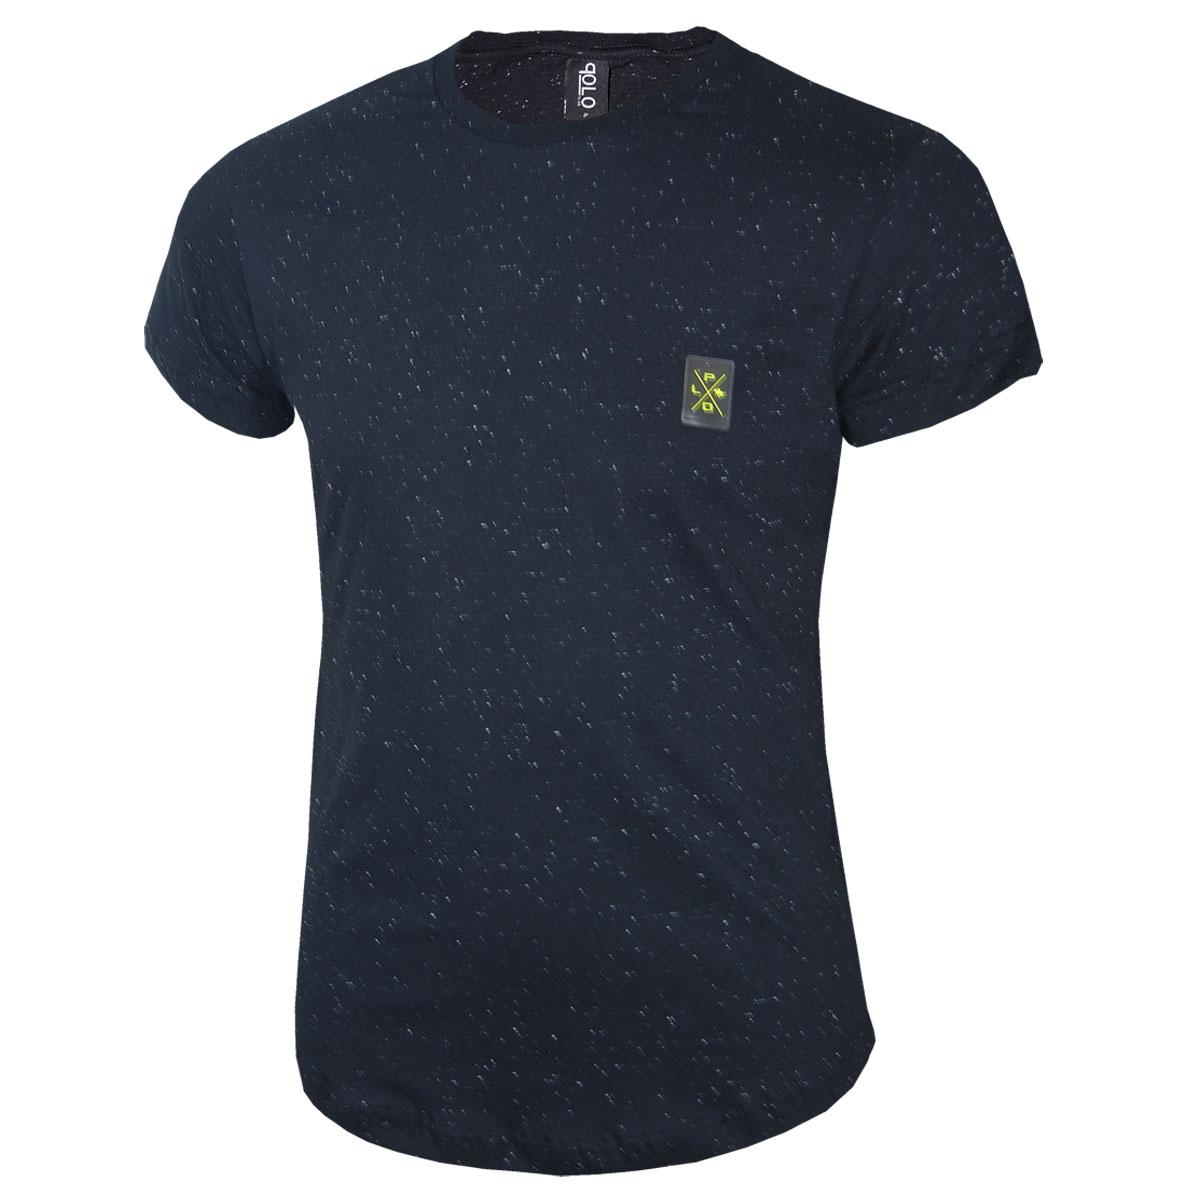 Camiseta Masculina Swag com Tape